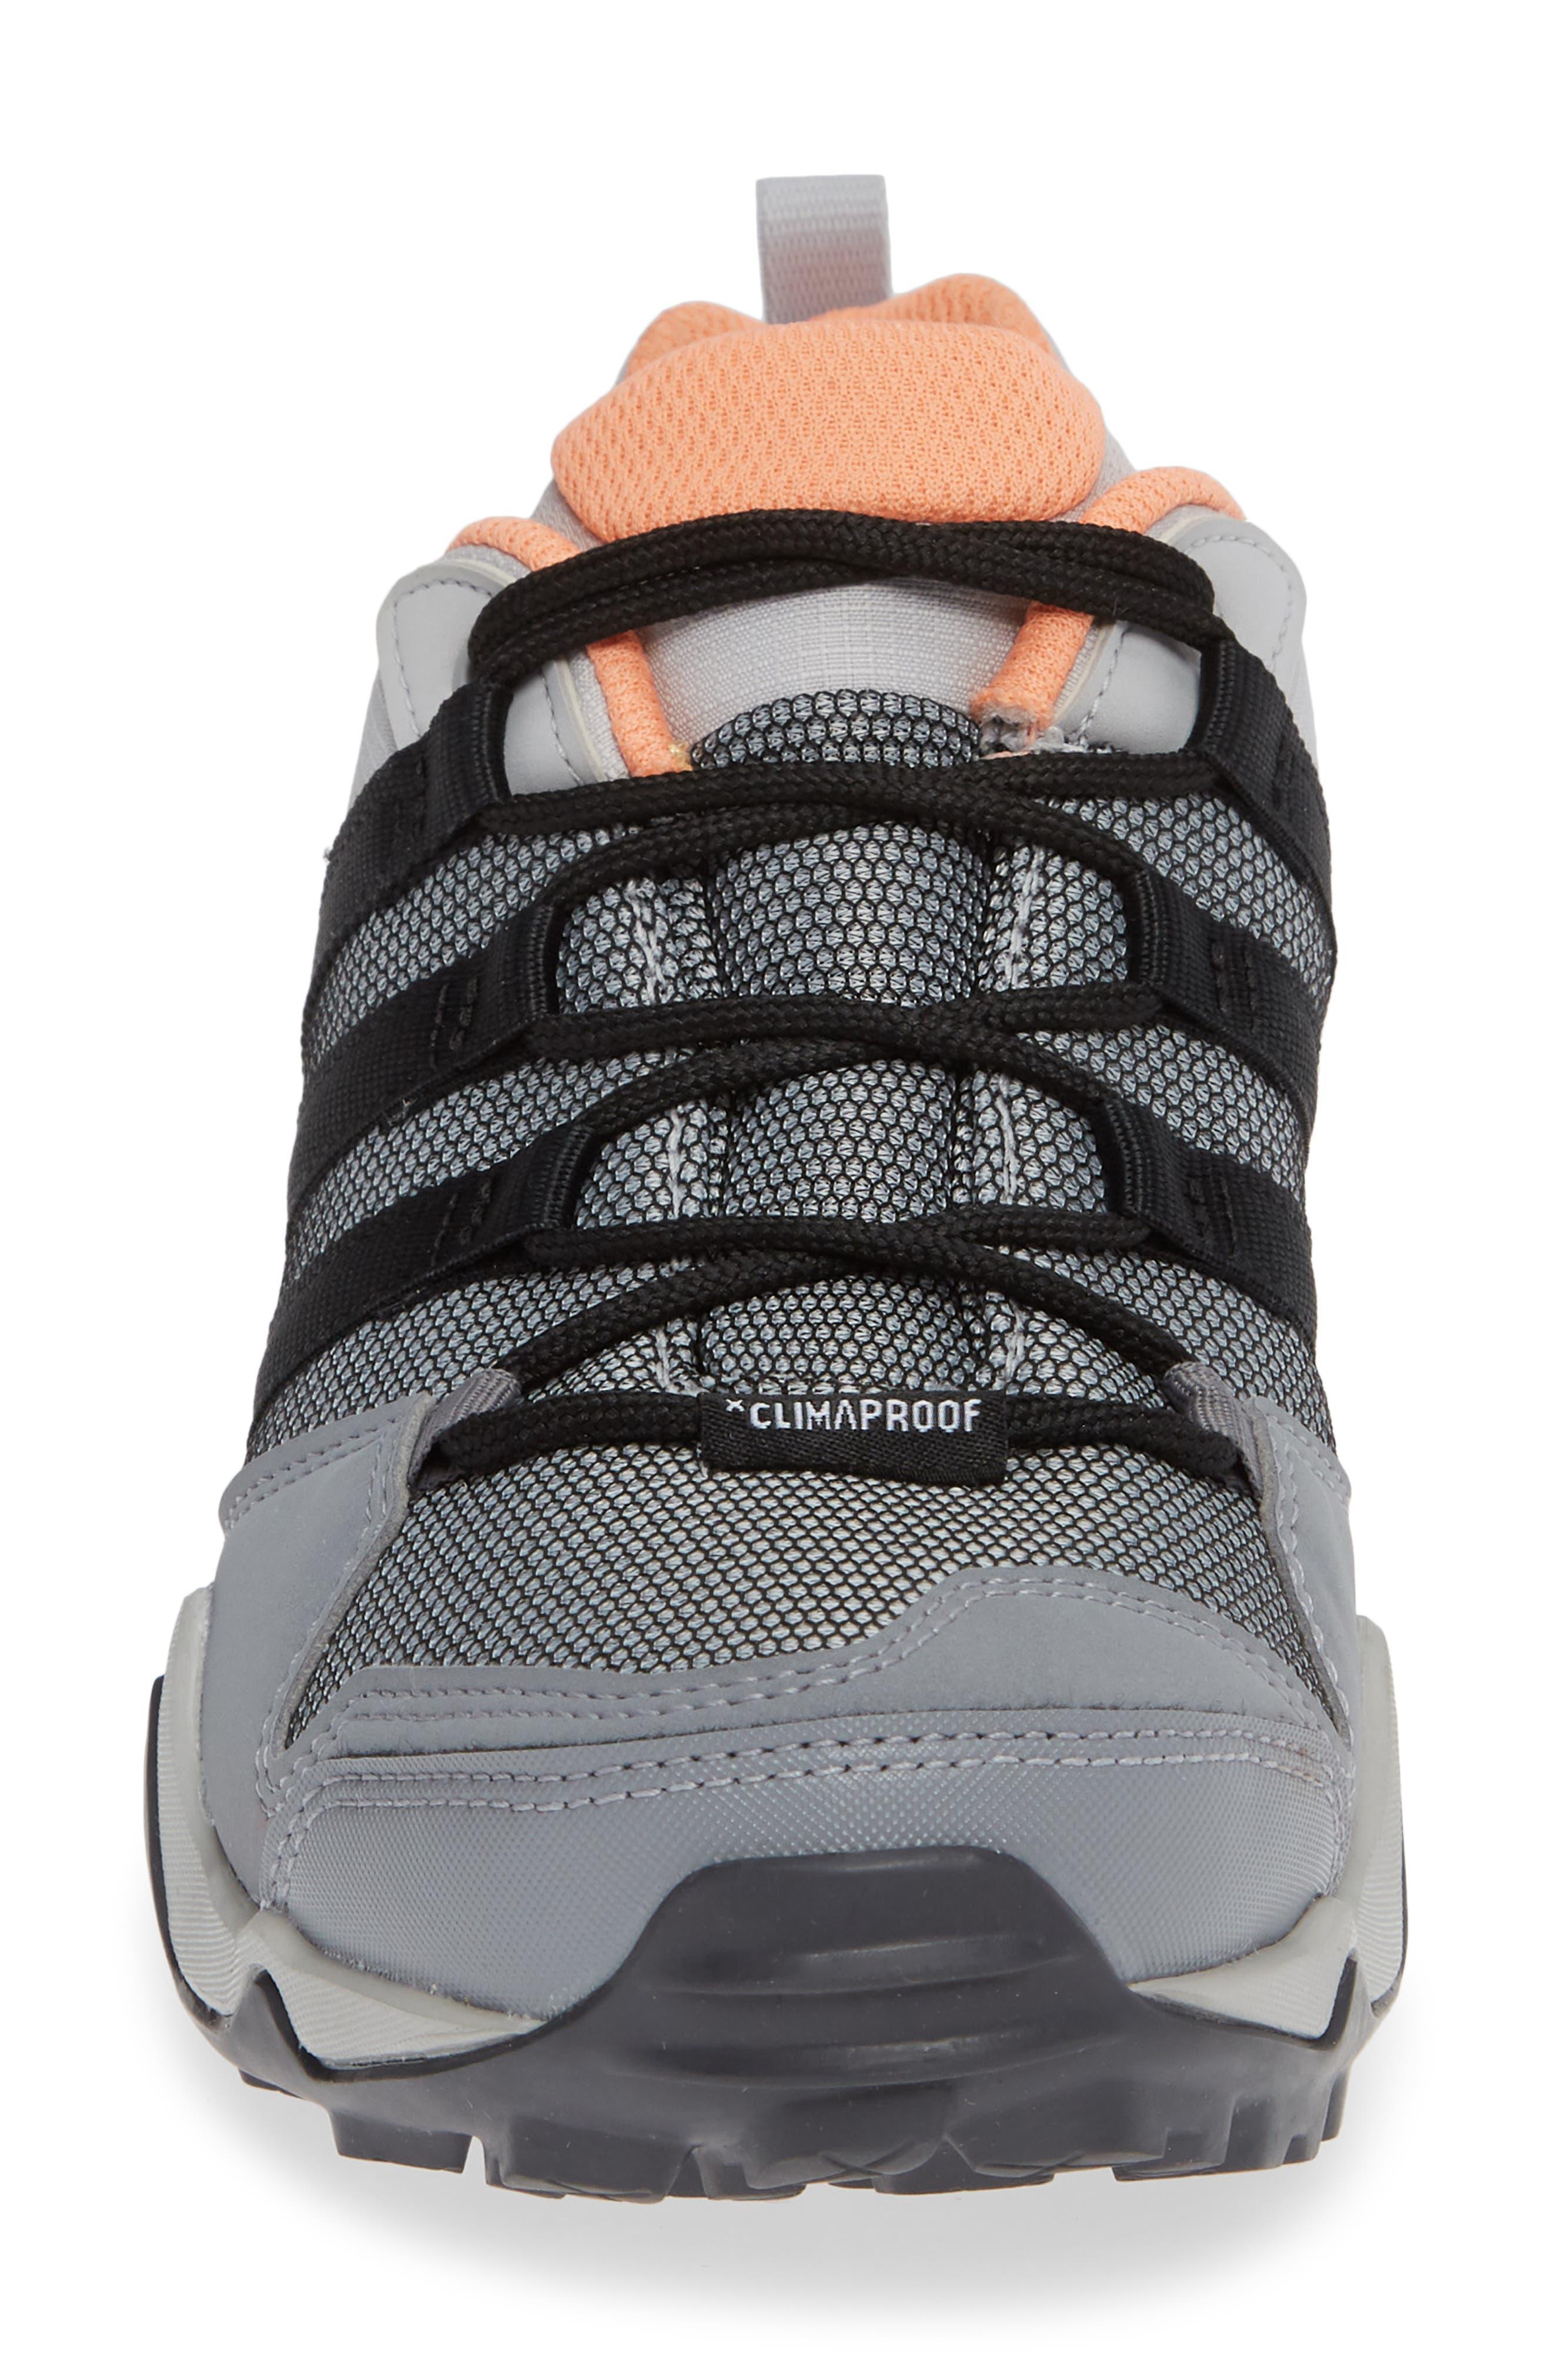 Terrex AX2 CLIMAPROOF<sup>®</sup> Hiking Shoe,                             Alternate thumbnail 4, color,                             GREY/ BLACK/ CHALK CORAL